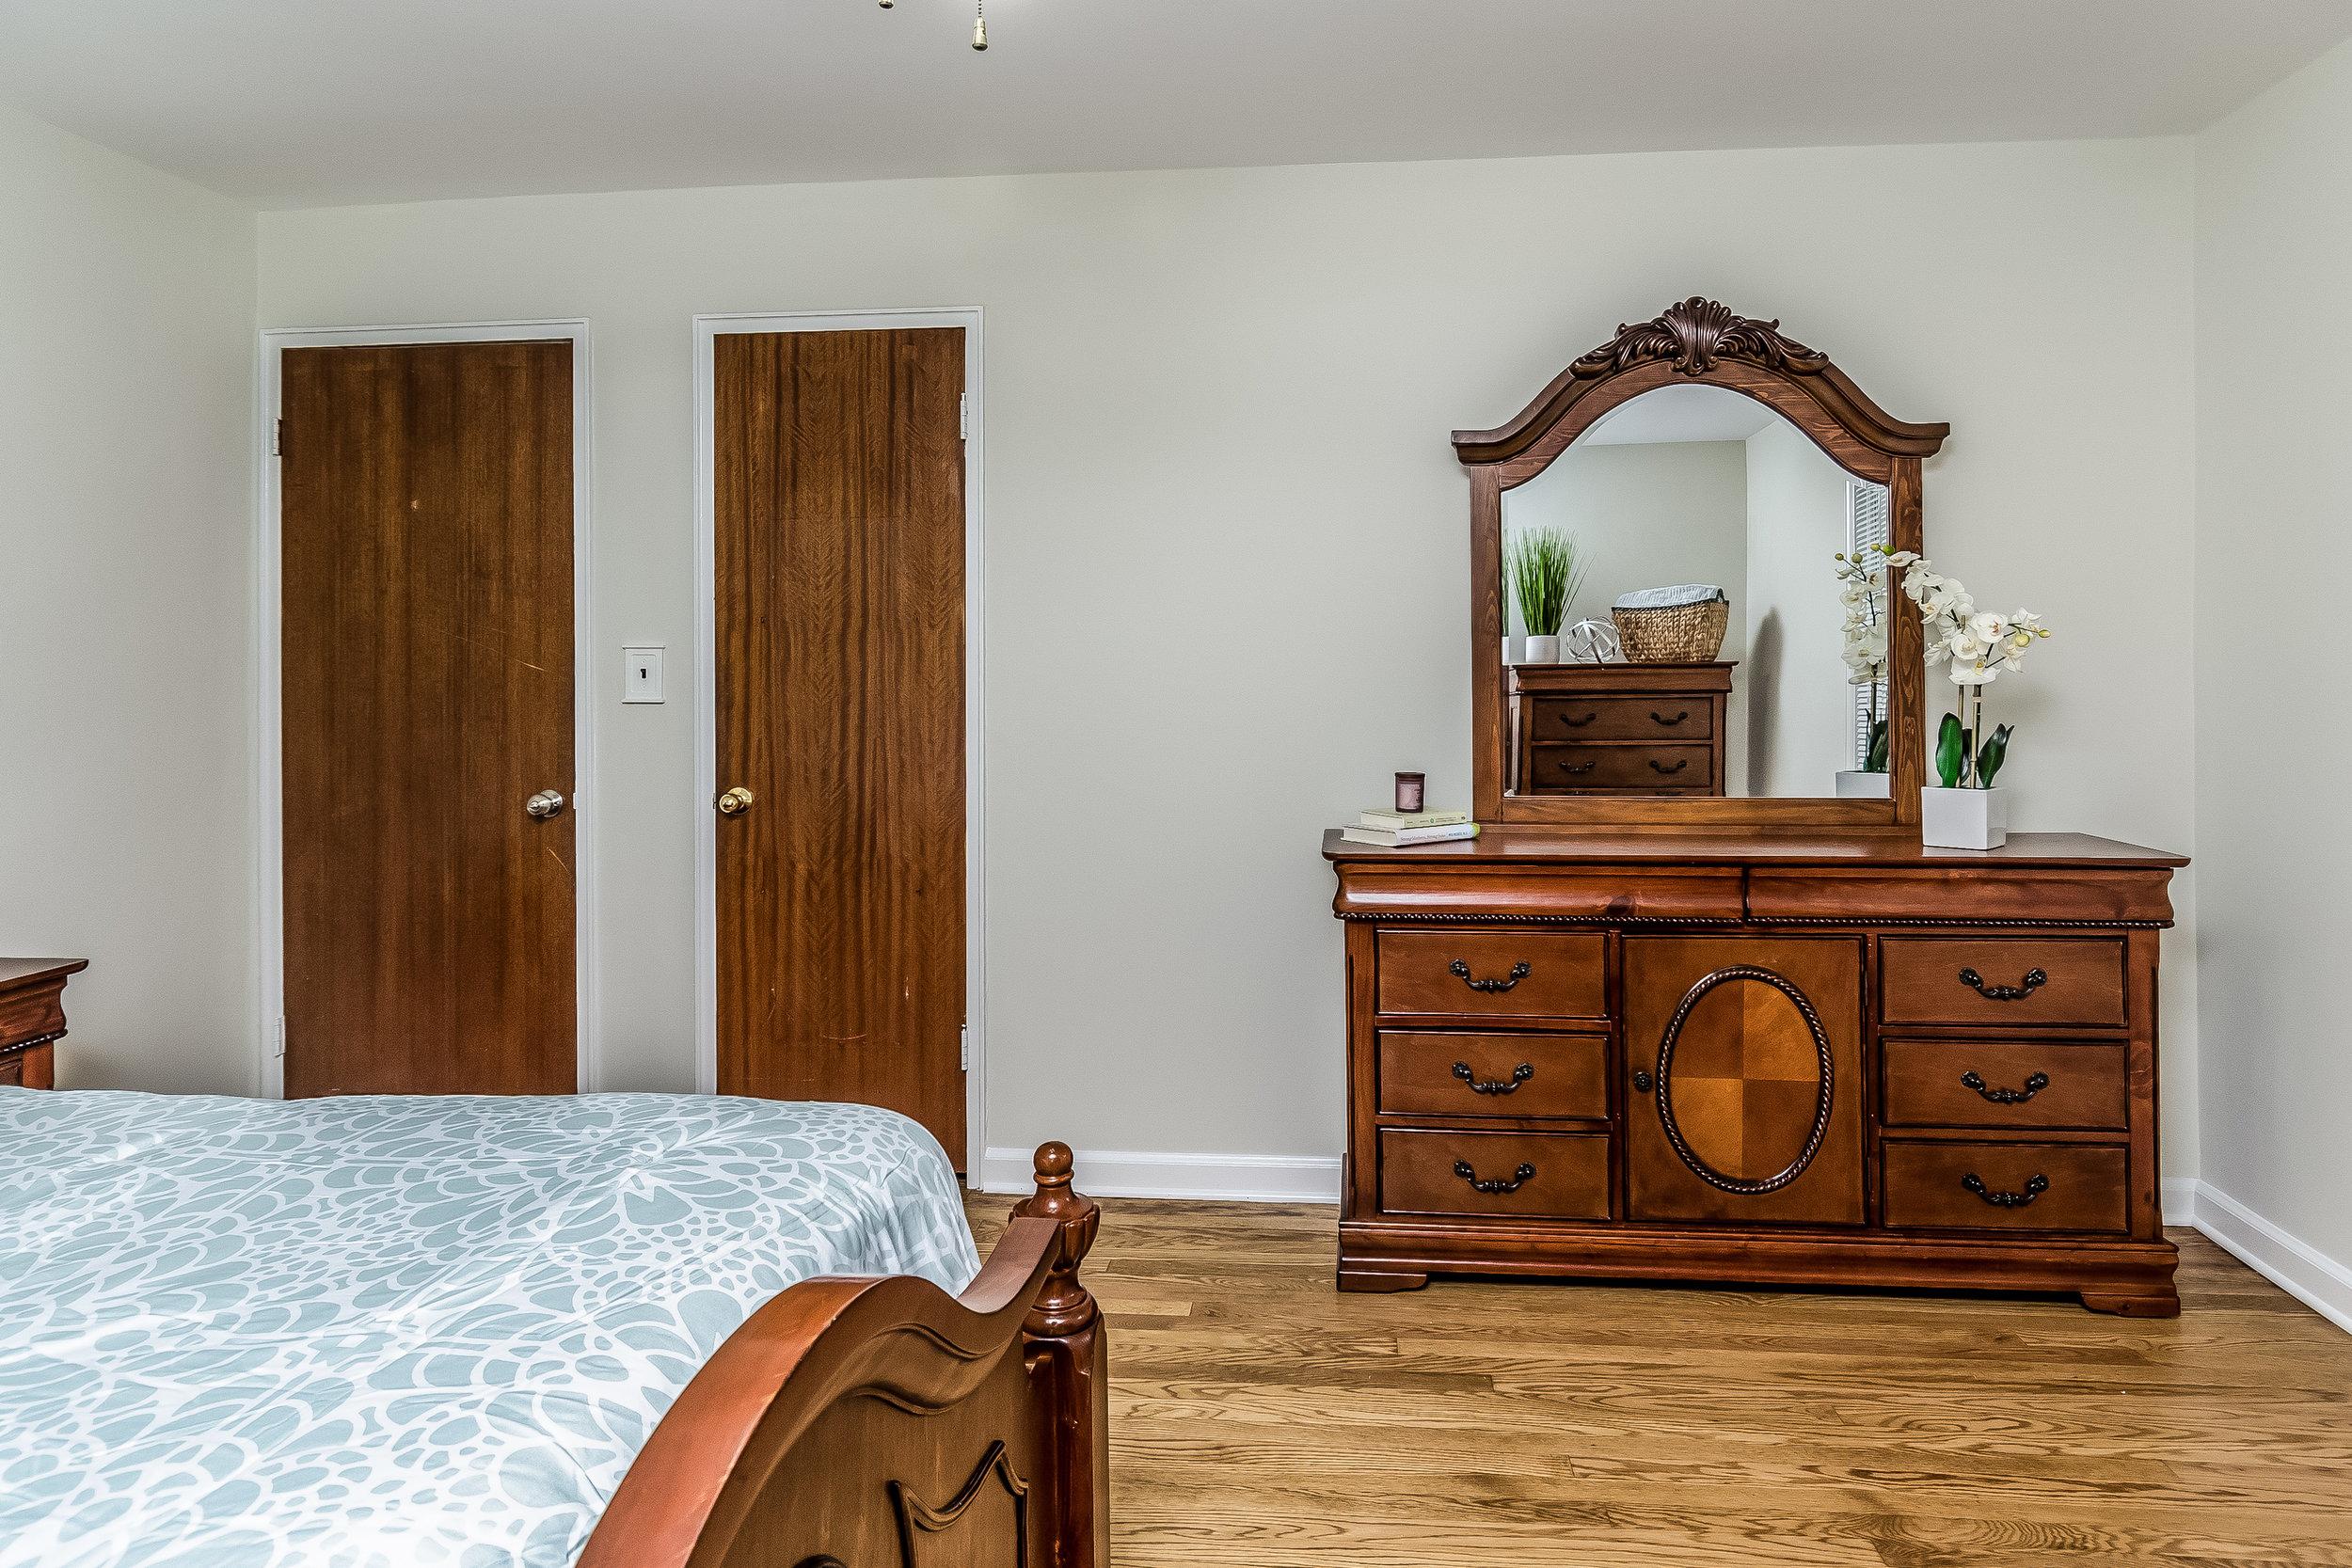 021-photo-master-bedroom-5786542.jpg